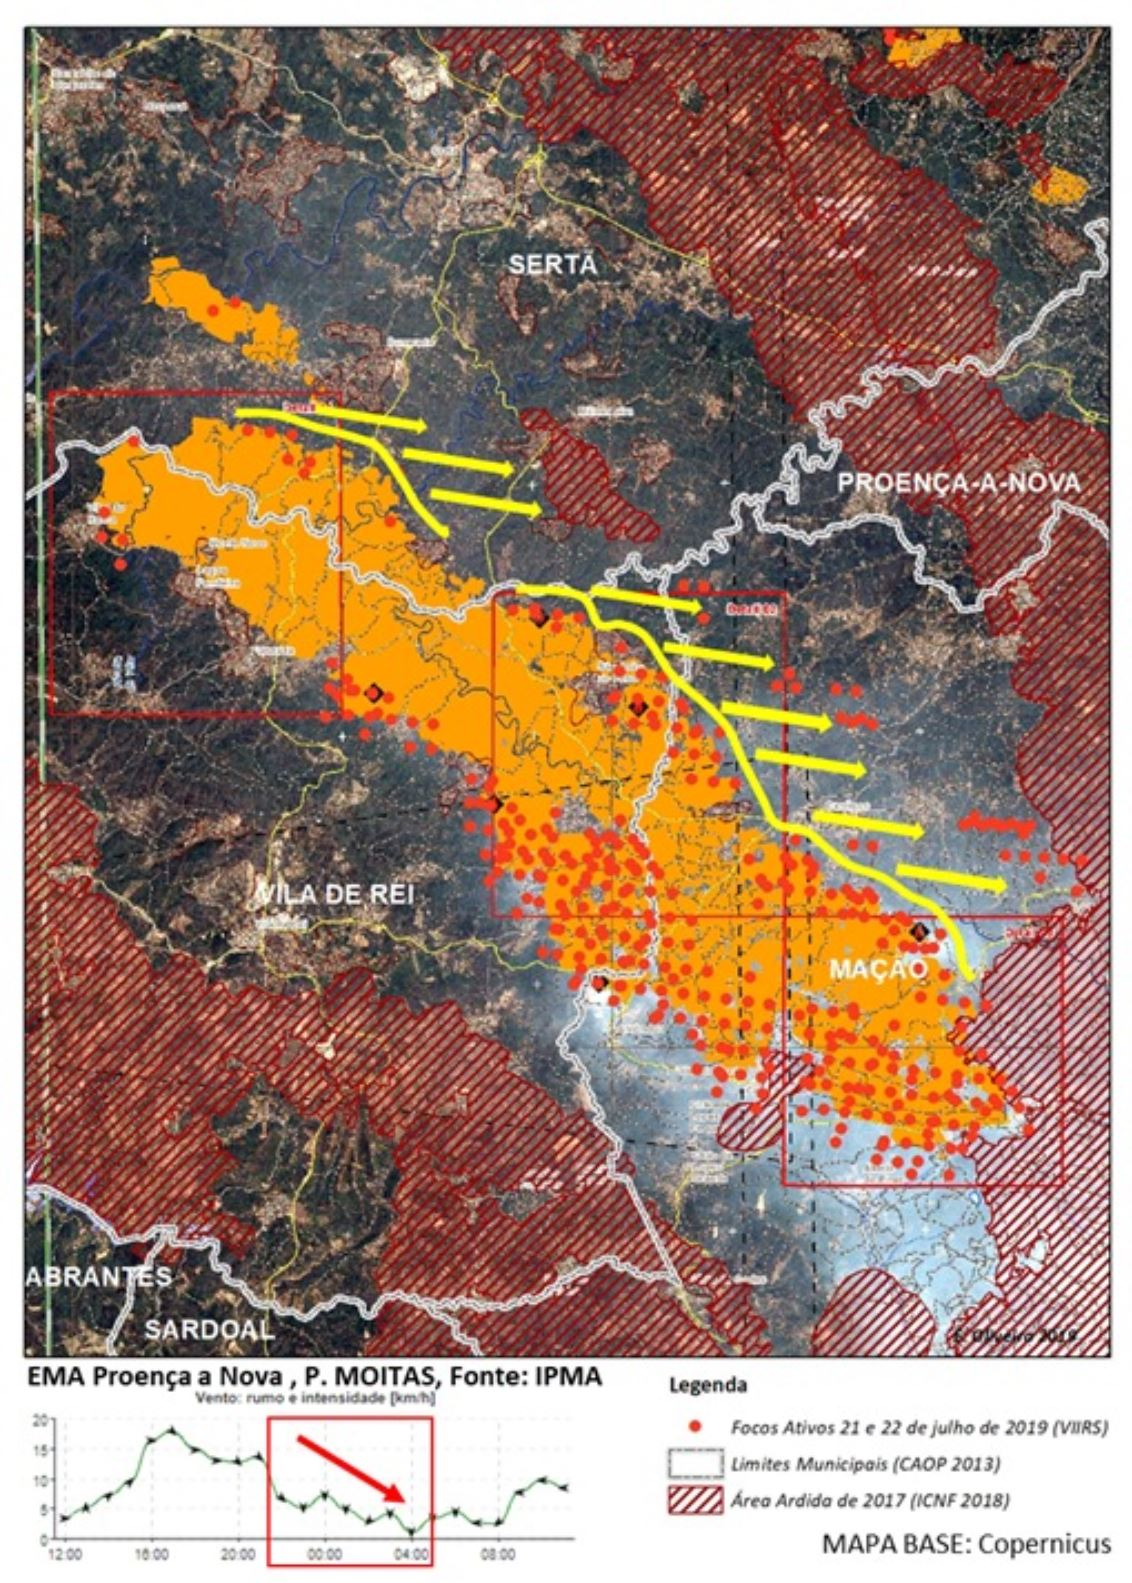 Waldbrände Portugal Karte.Portugal Waldbrände Wetterprognose Beunruhigt Am Montag Algarve